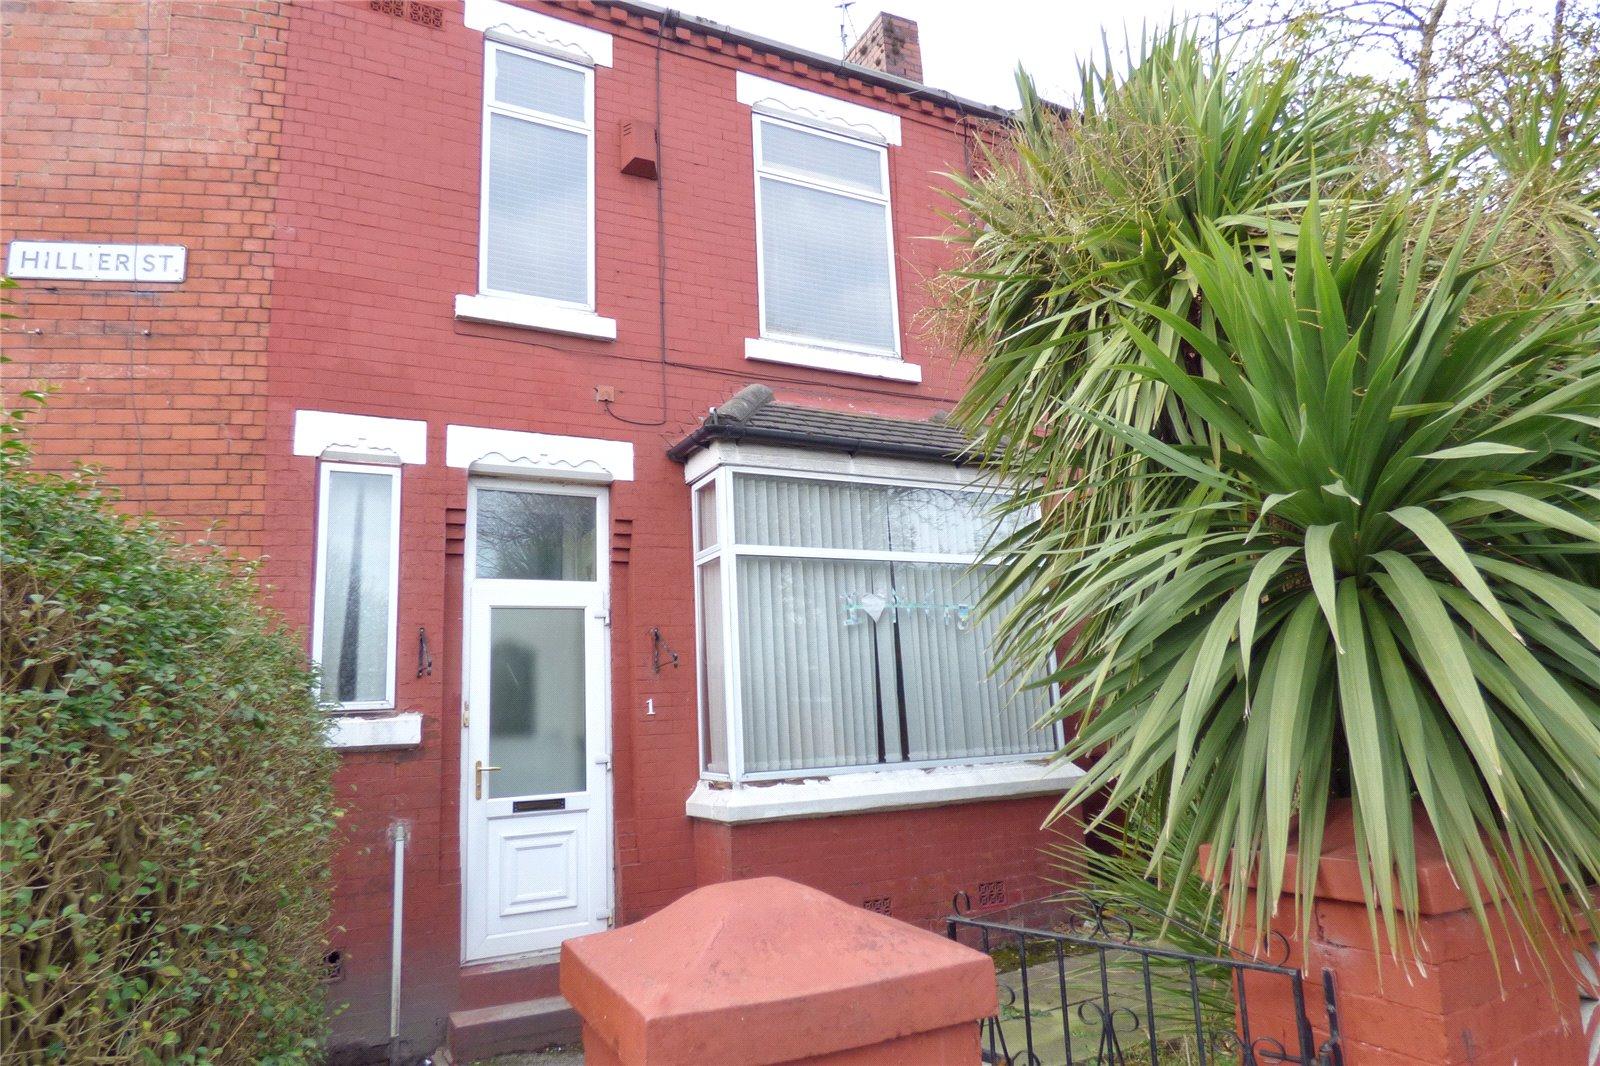 3 Bedrooms End Of Terrace House for sale in Davenport Terrace, Hillier Street, Harpurhey, Manchester, M9